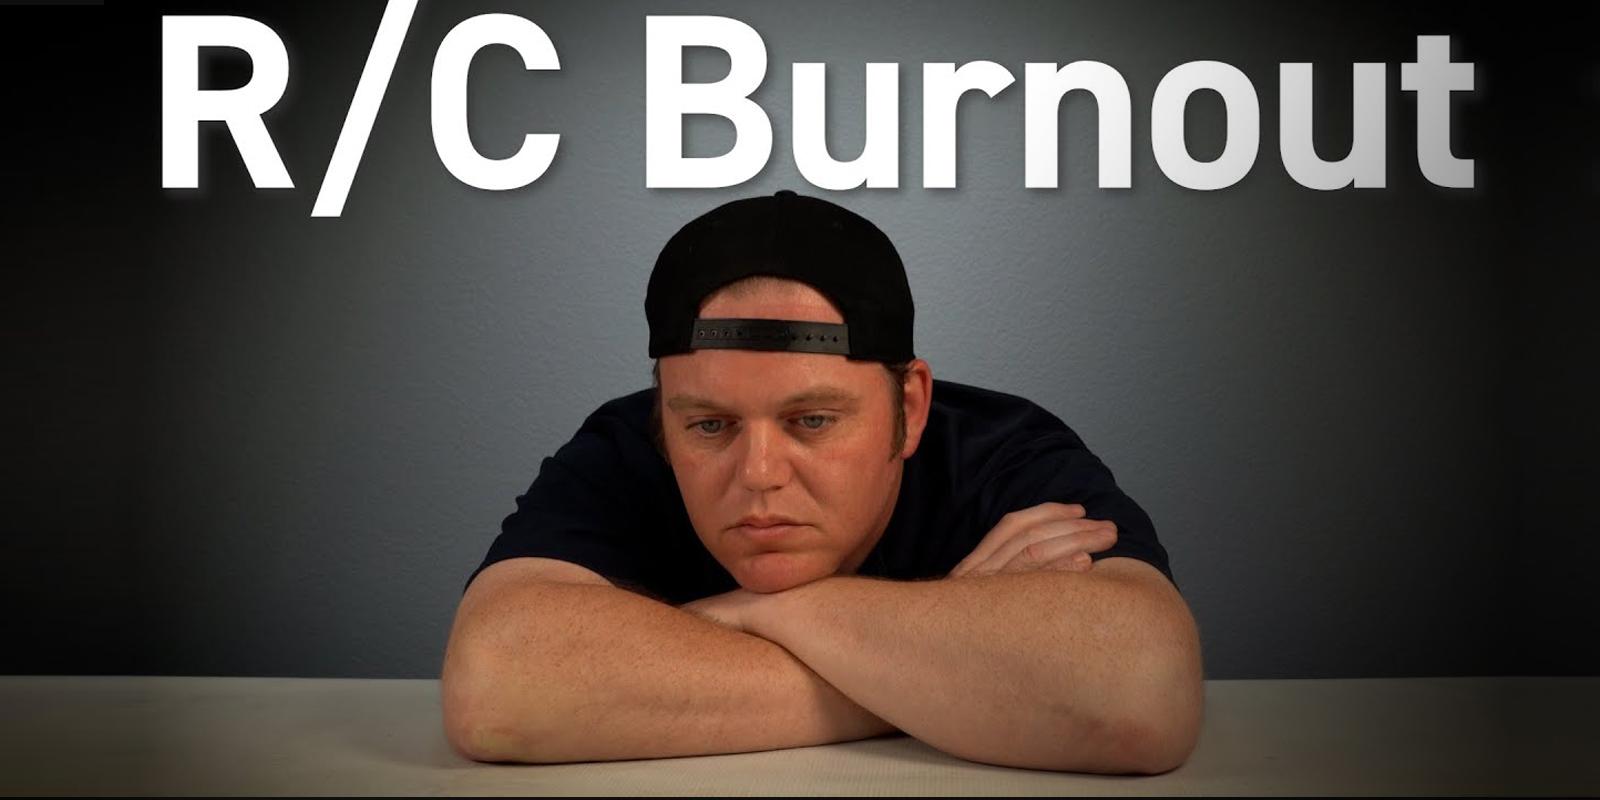 Avoid R/C Burnout - 5 Simple Tips